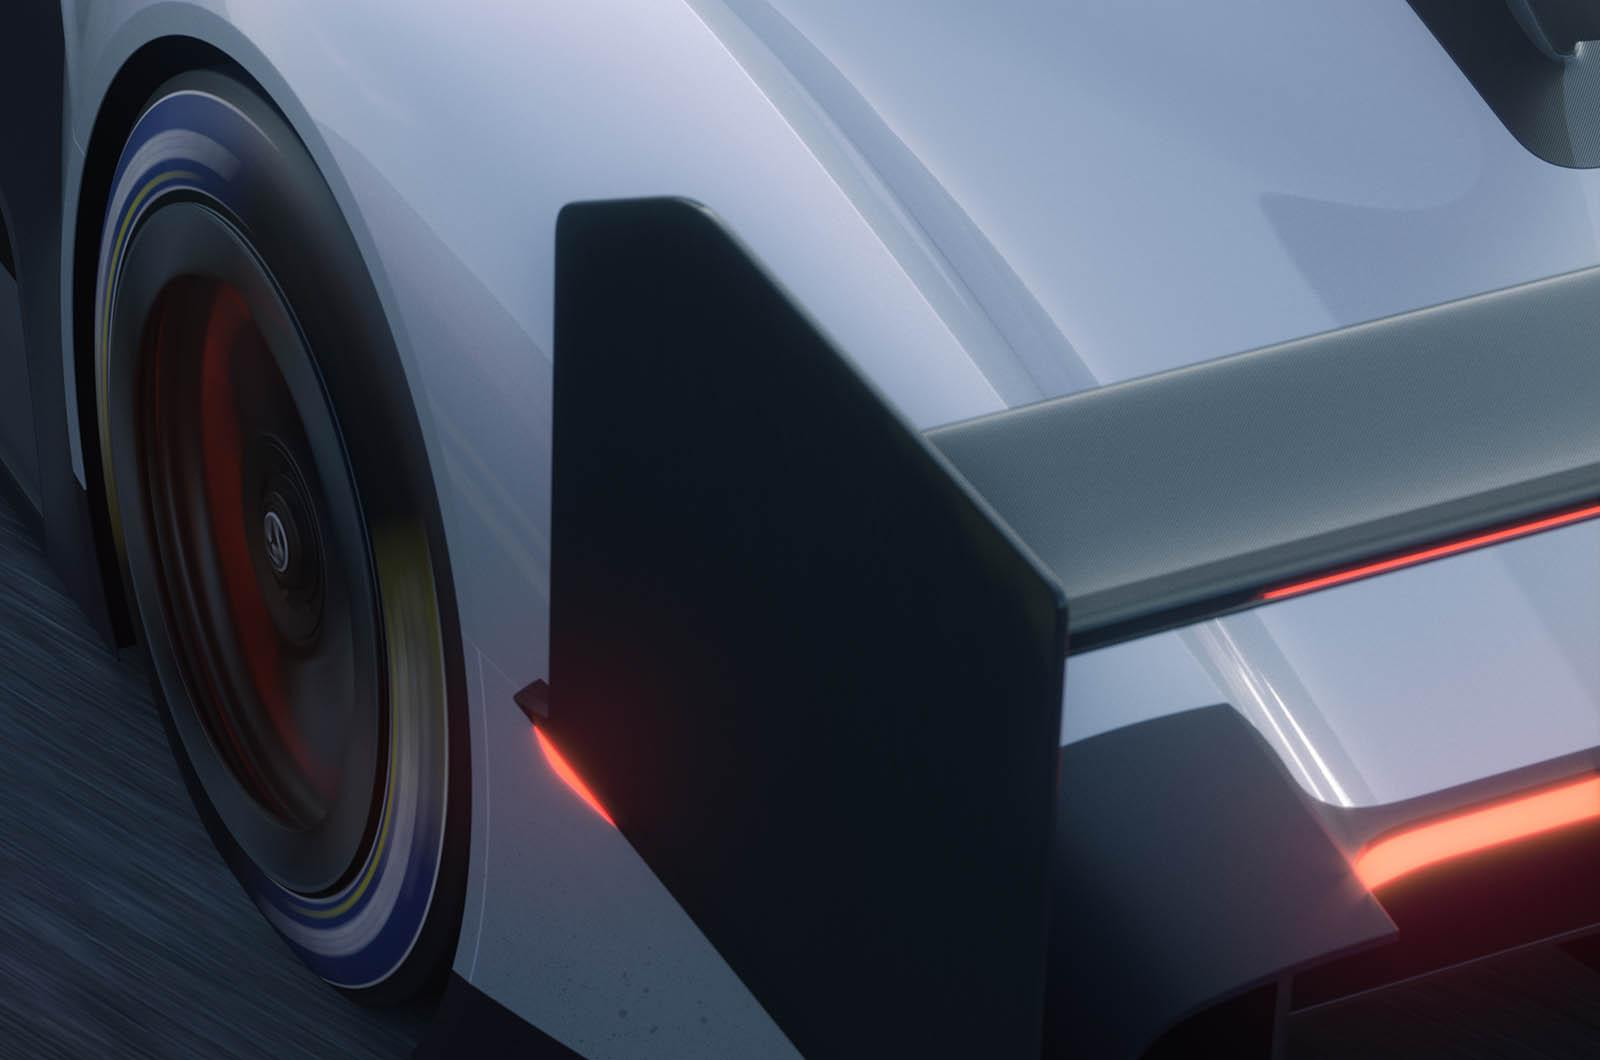 Фольксваген представил гоночную модельID RPikes Peak